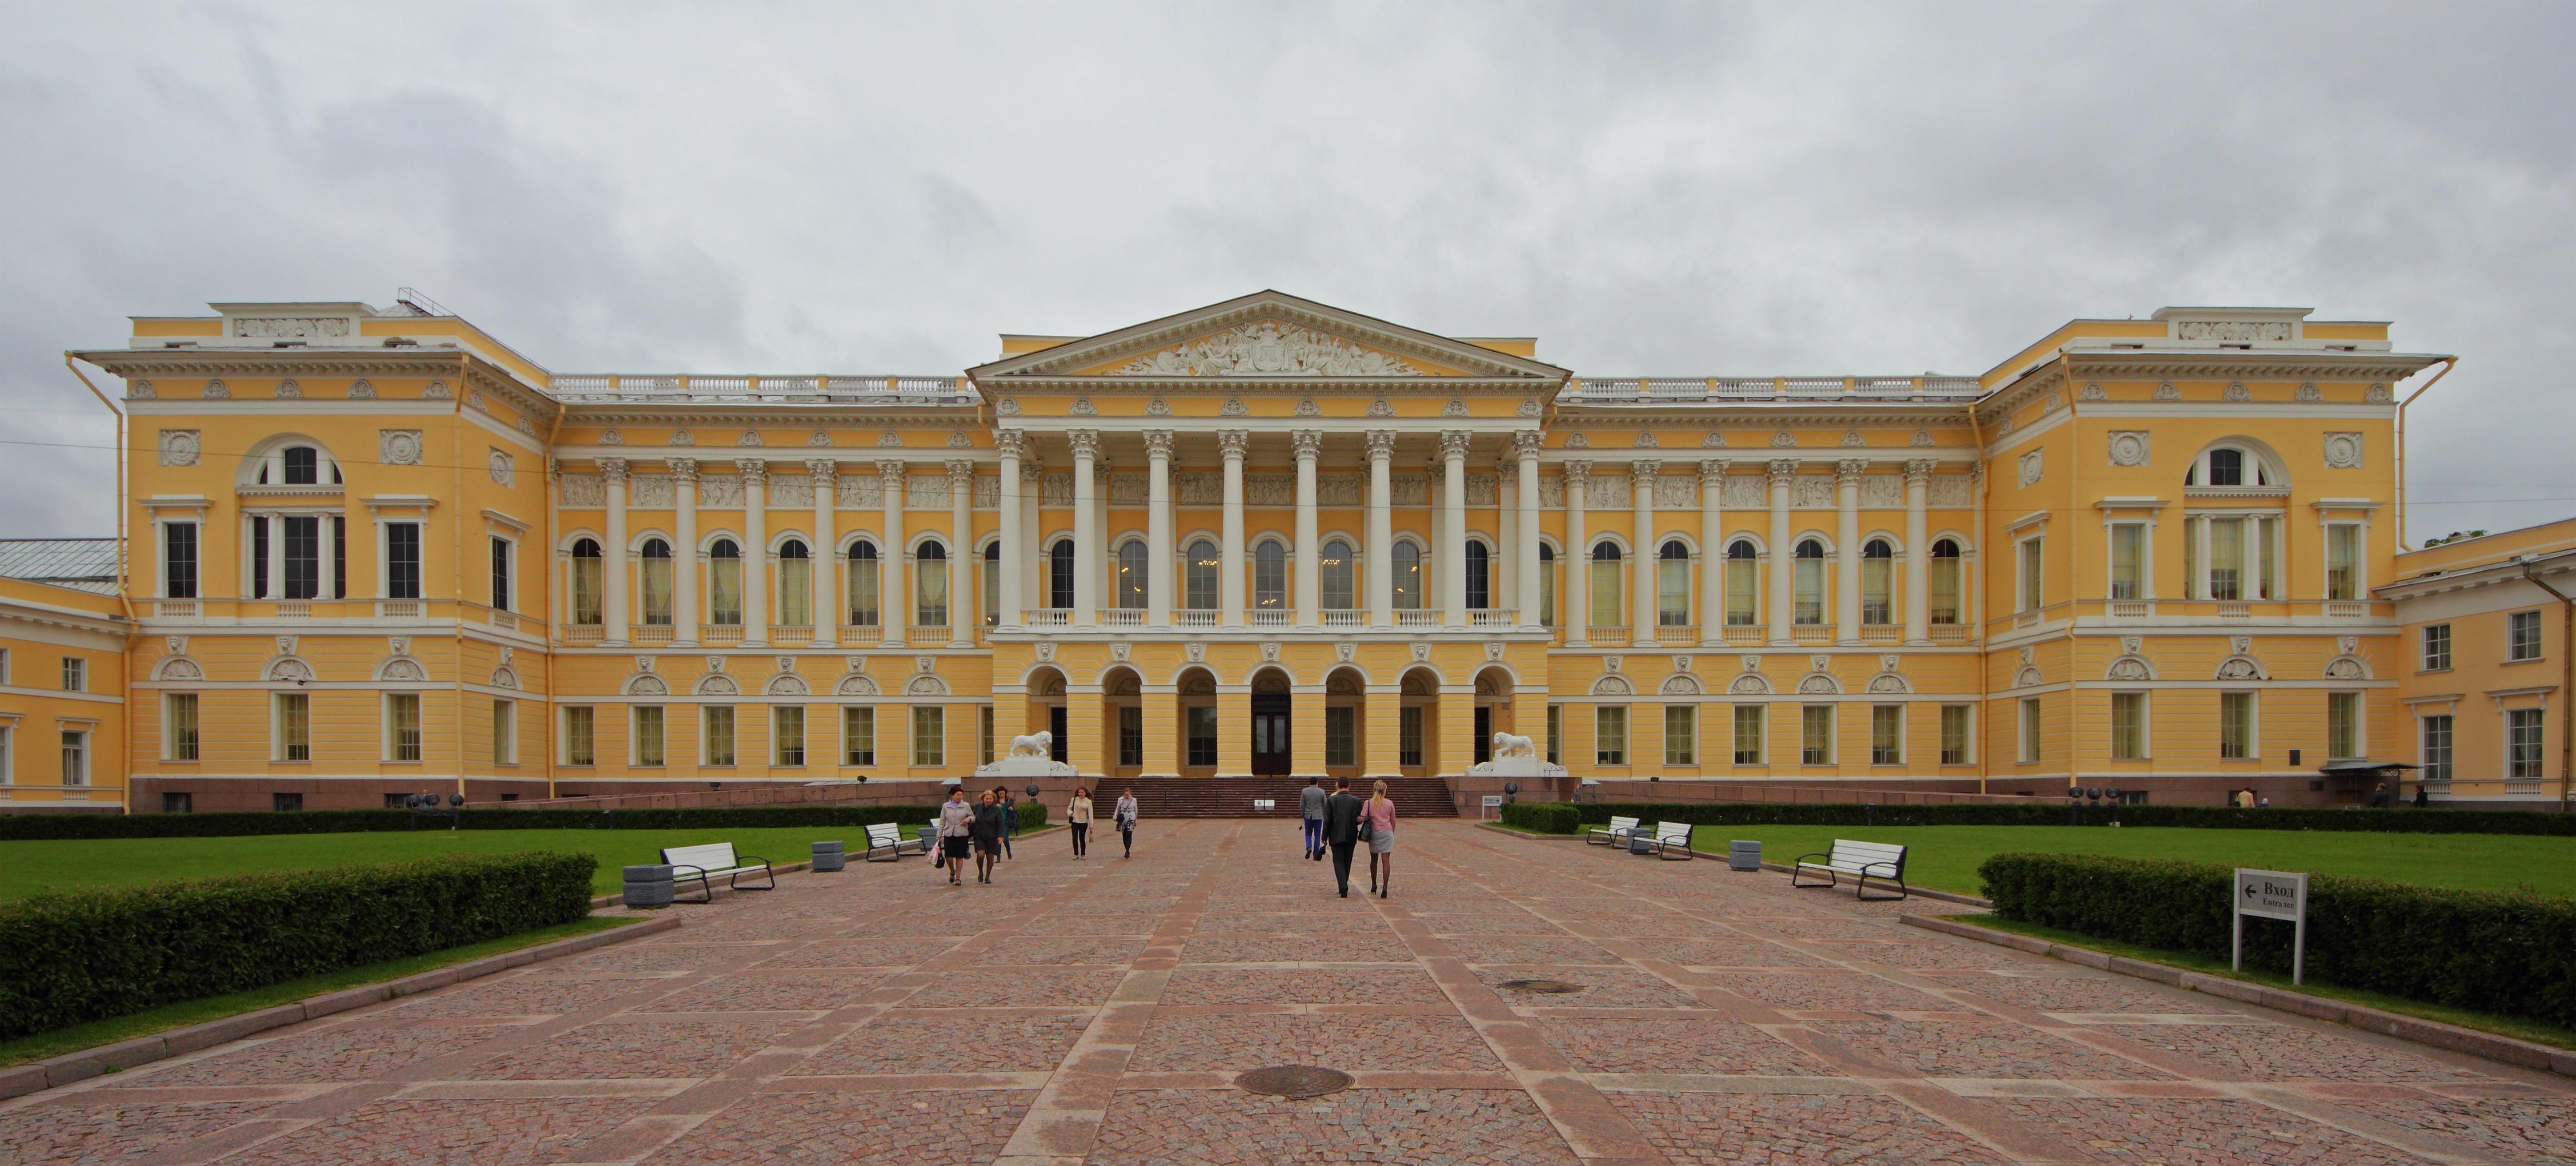 sankt petersborg museum for kunst og kulturhistorie